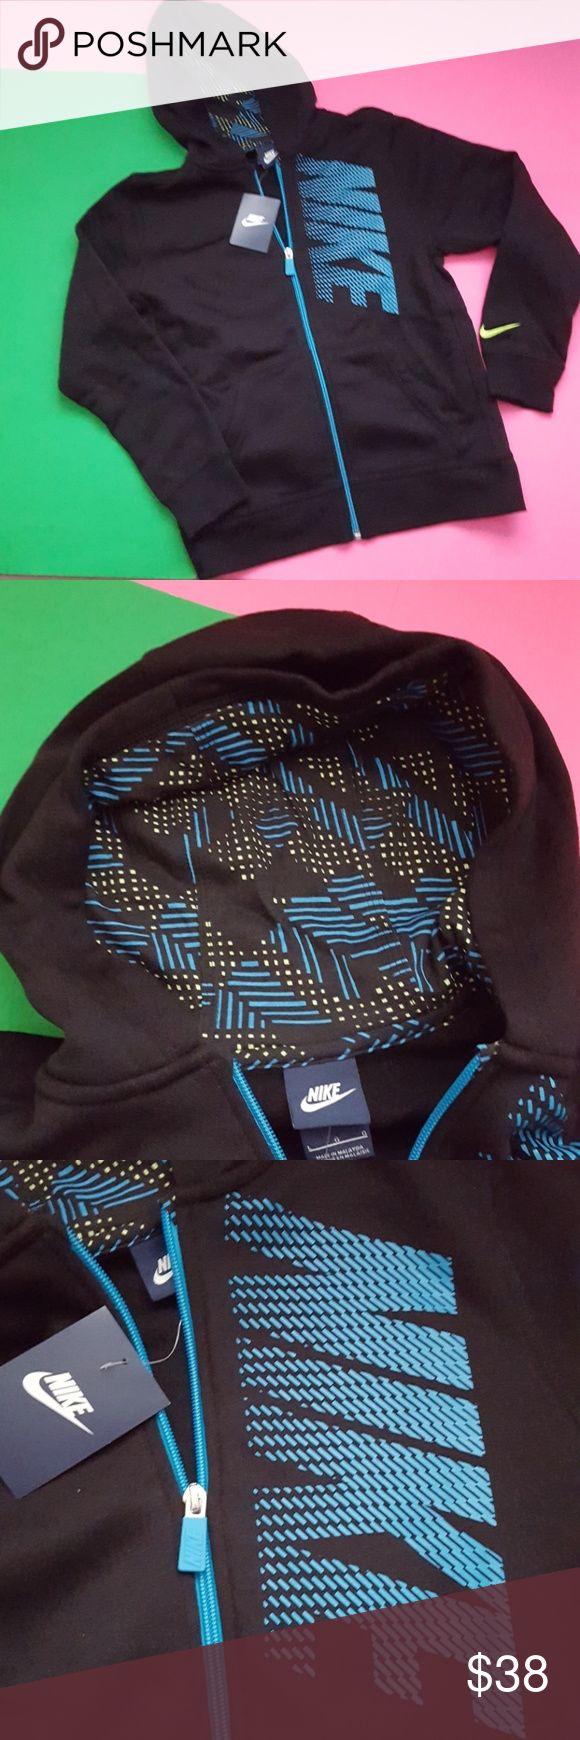 Nike Fleece Hoodie for Boys Brand new. Nike Shirts & Tops Sweatshirts & Hoodies